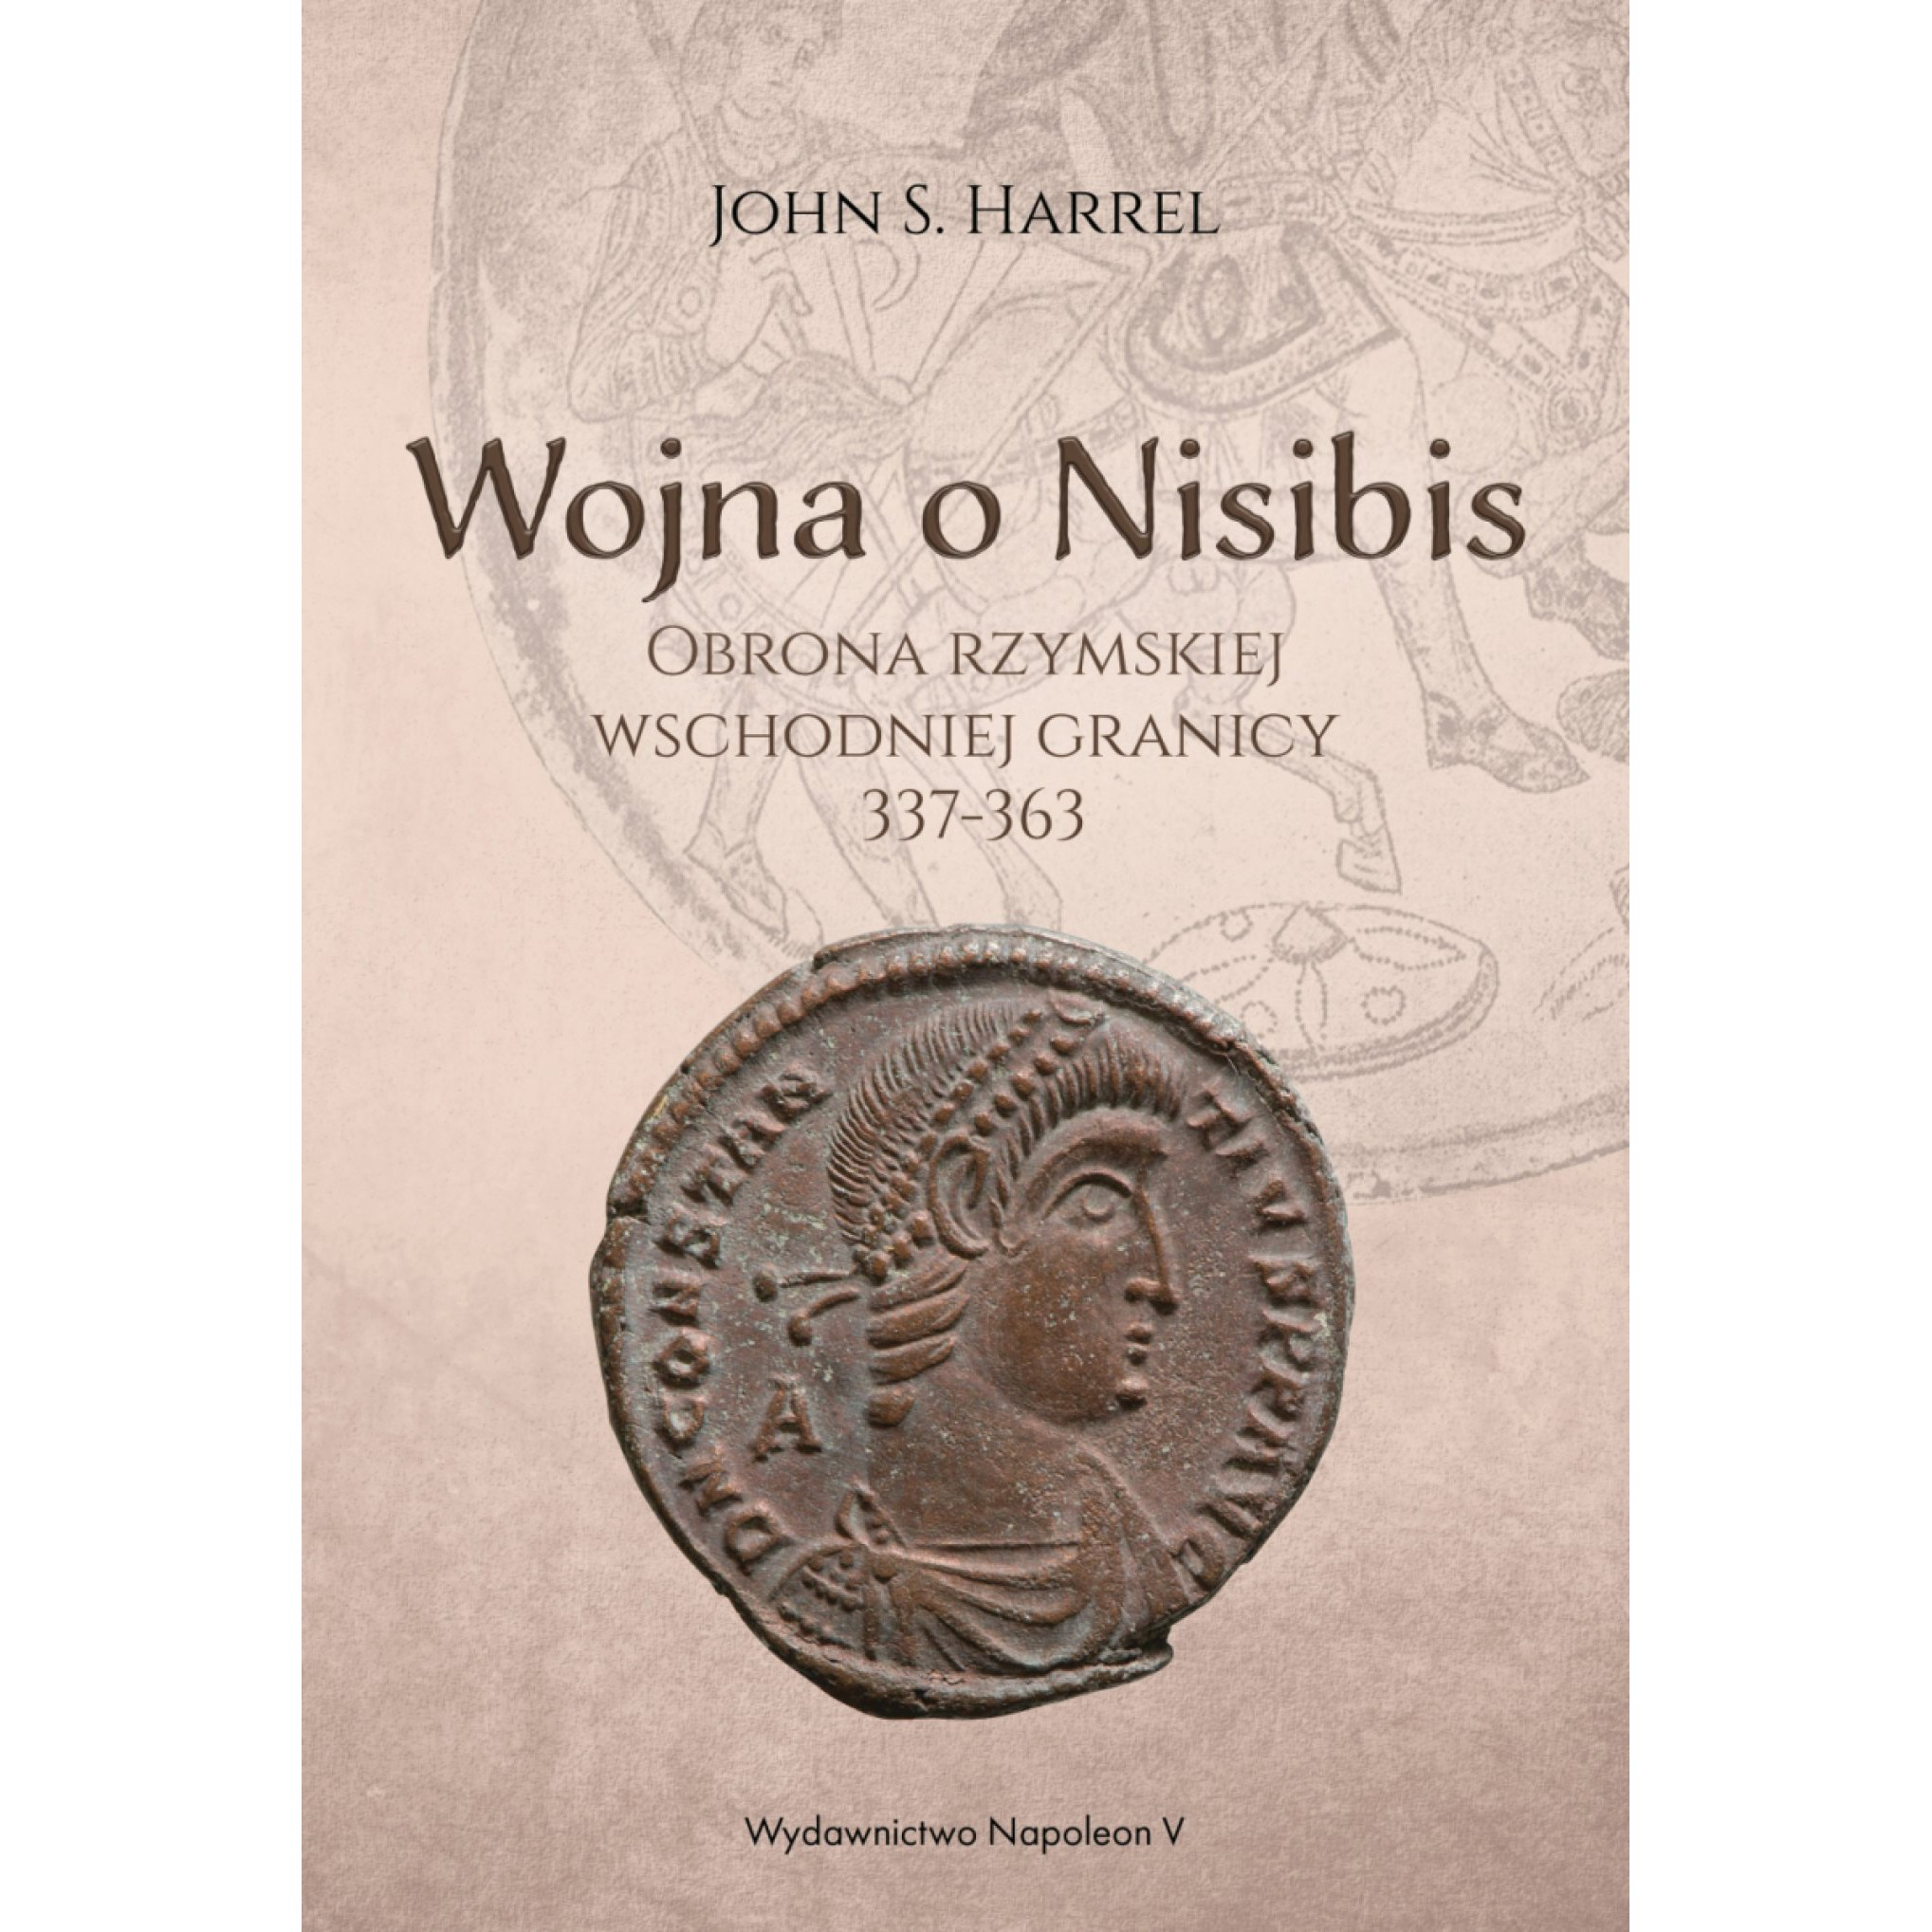 Wojna o Nisibis, 337-363